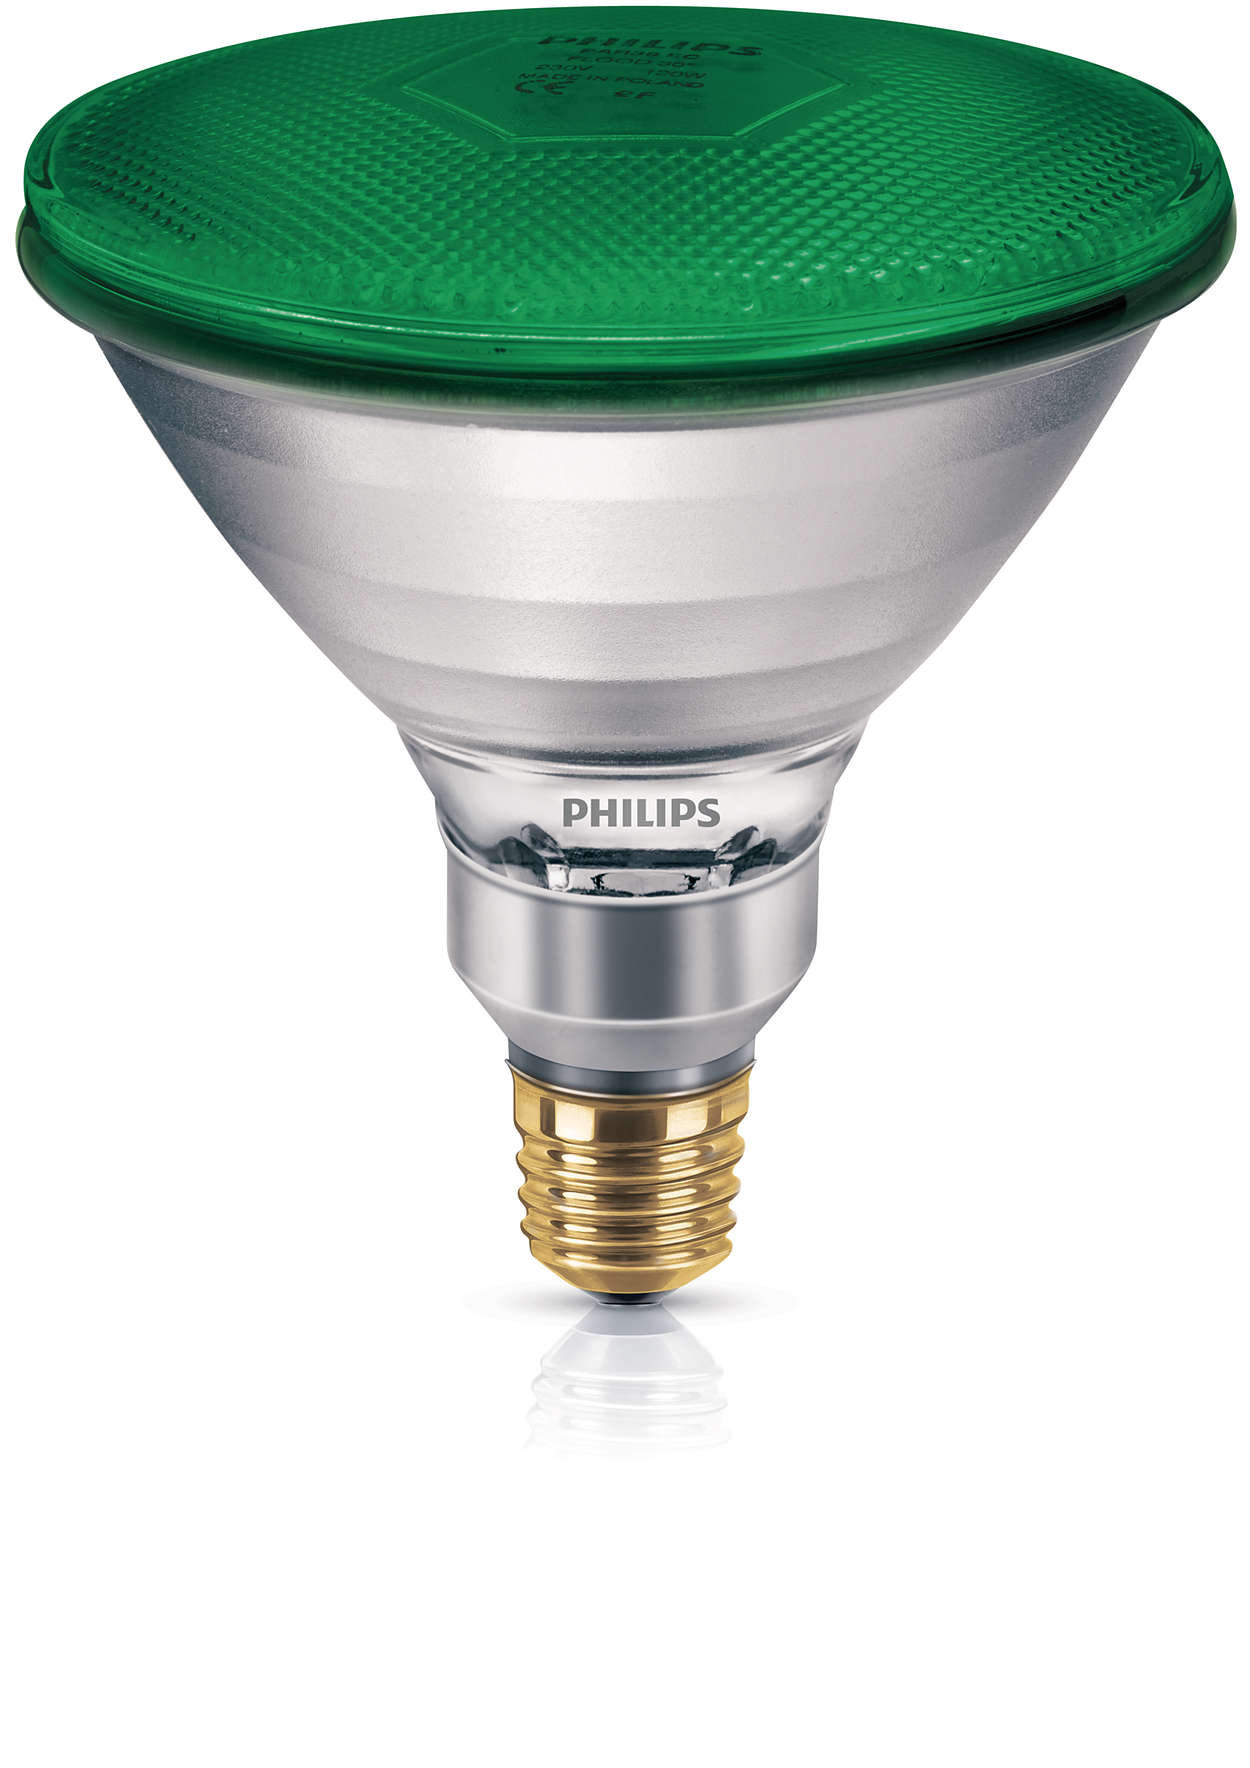 Farget reflektorlyskilde i pressglass